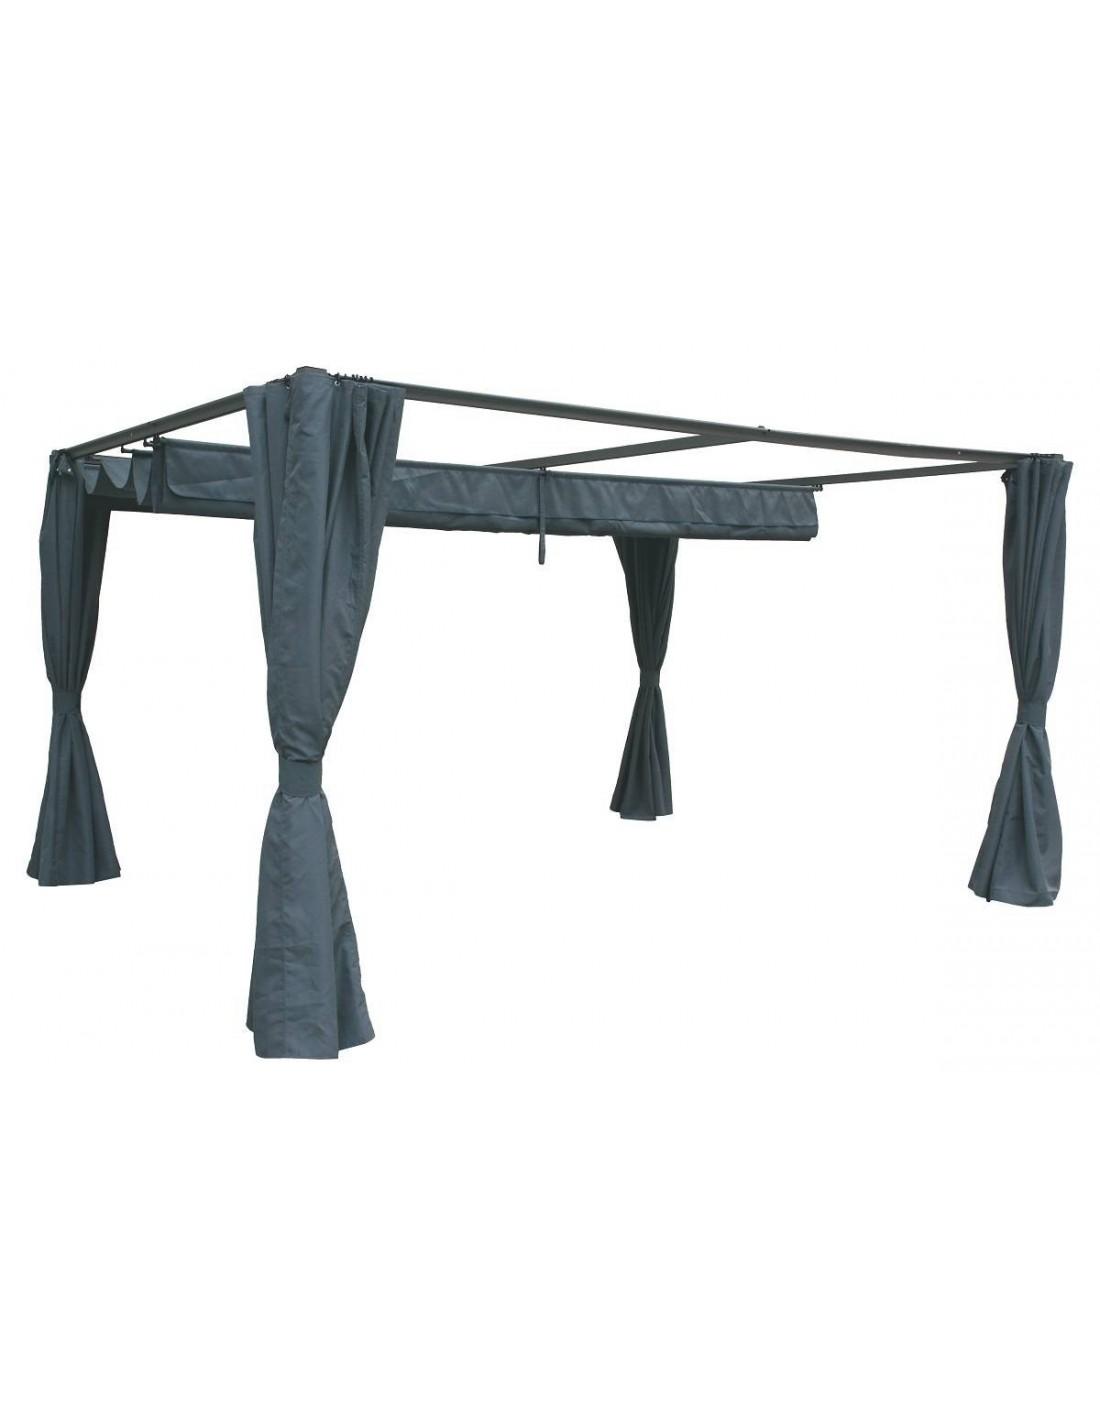 tonnelle de jardin palmeira ardoise en aluminium 3 x 4 m hesp ride. Black Bedroom Furniture Sets. Home Design Ideas